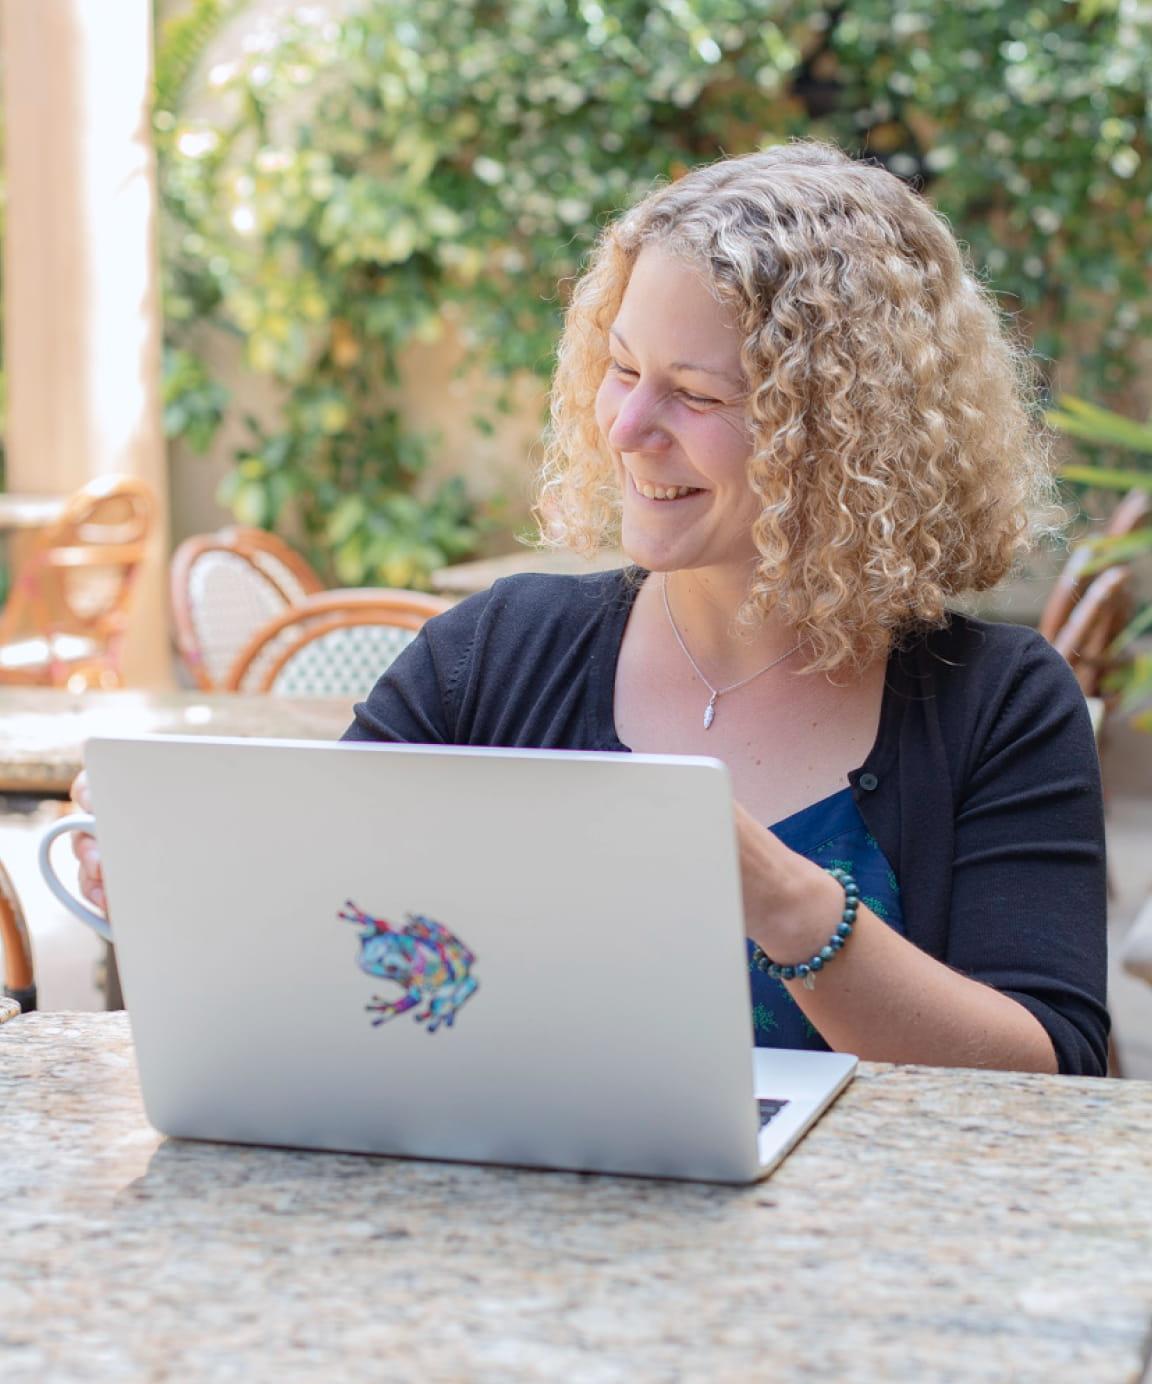 Image of Michelle, a Xolo customer.